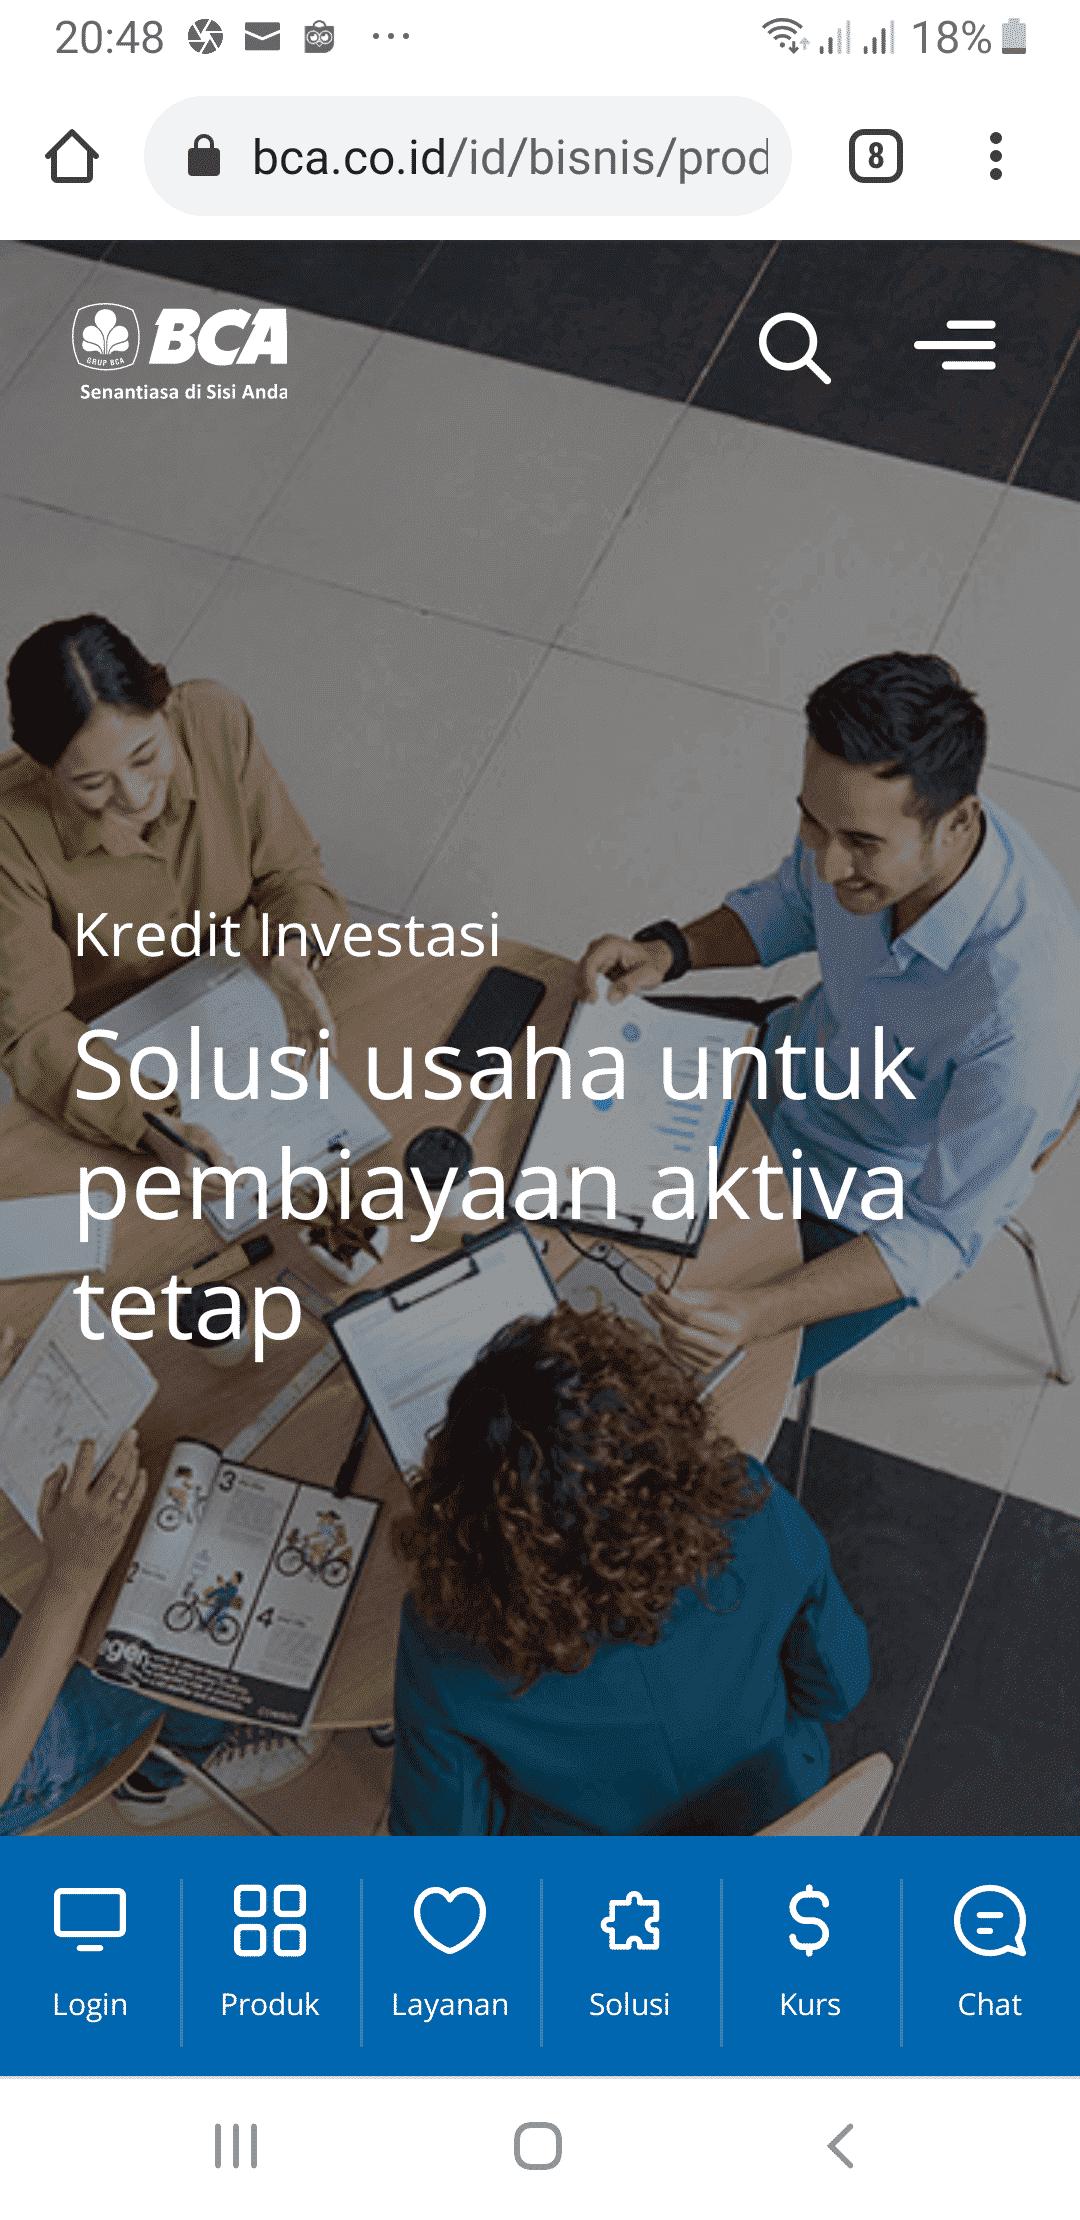 Pinjaman Usaha BCA Kredit Investasii